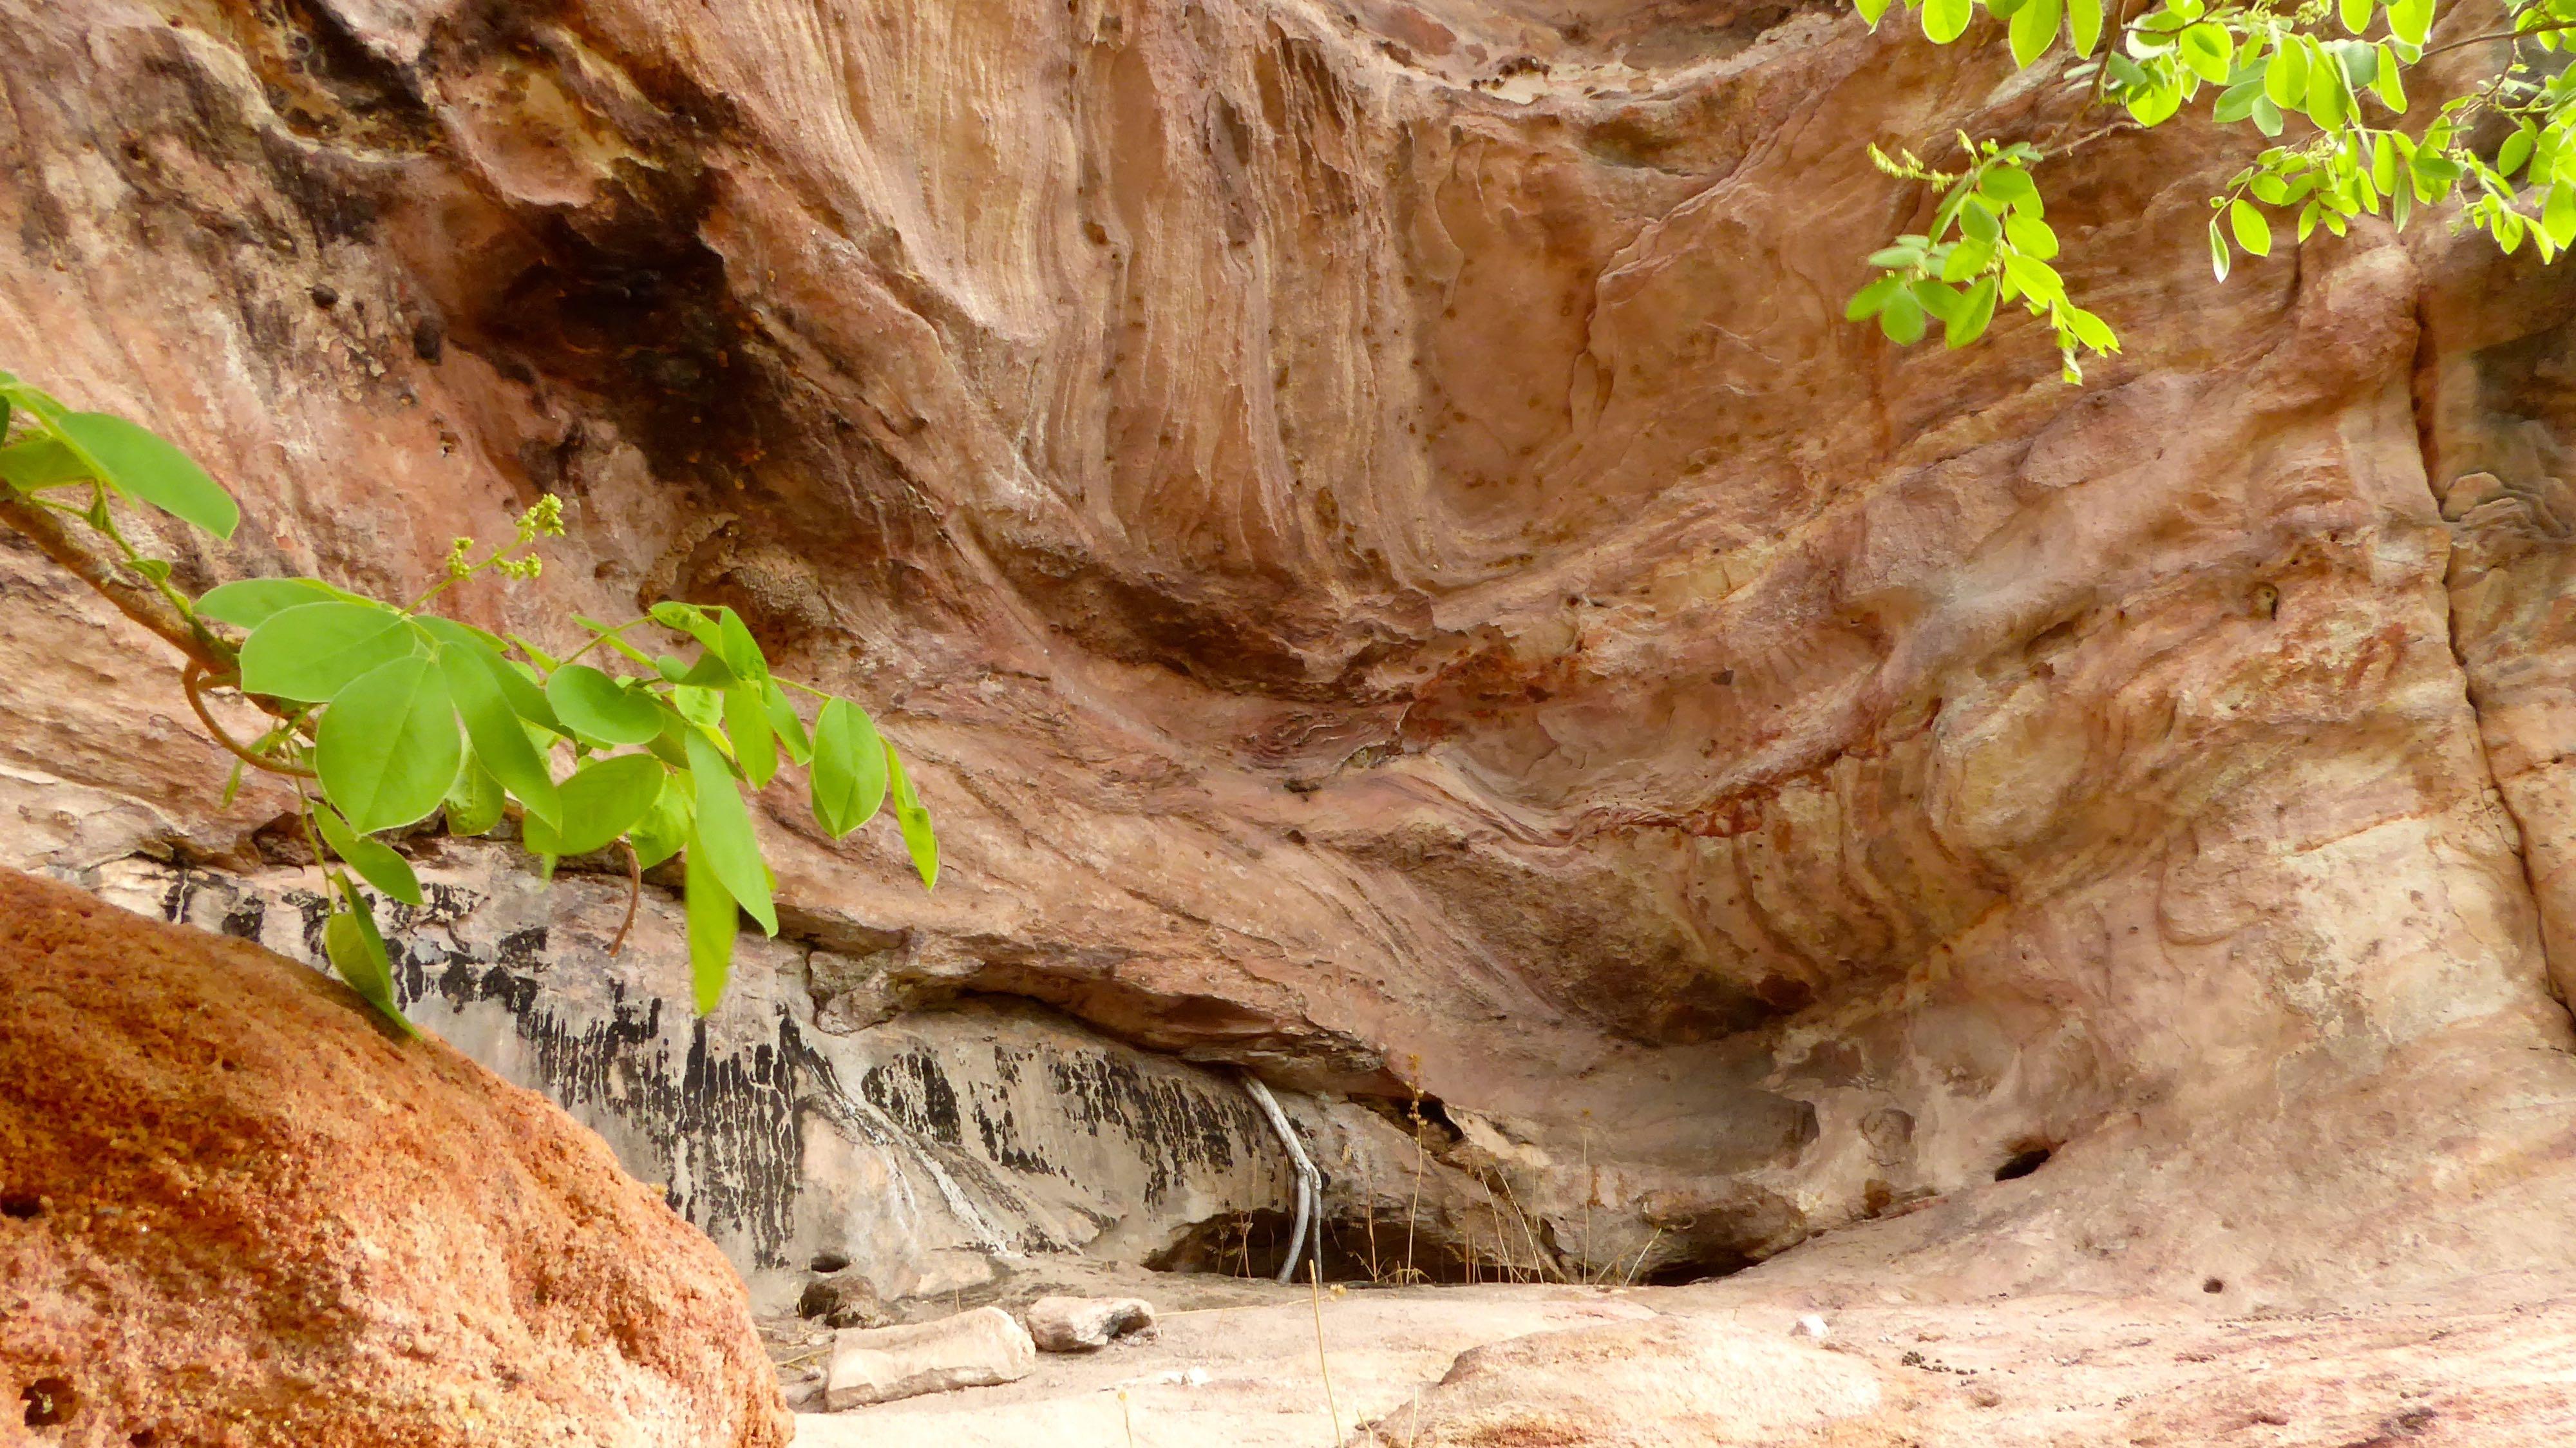 Lotri Bay, Lake Kariba, Zambia - Cave, Rock Formation